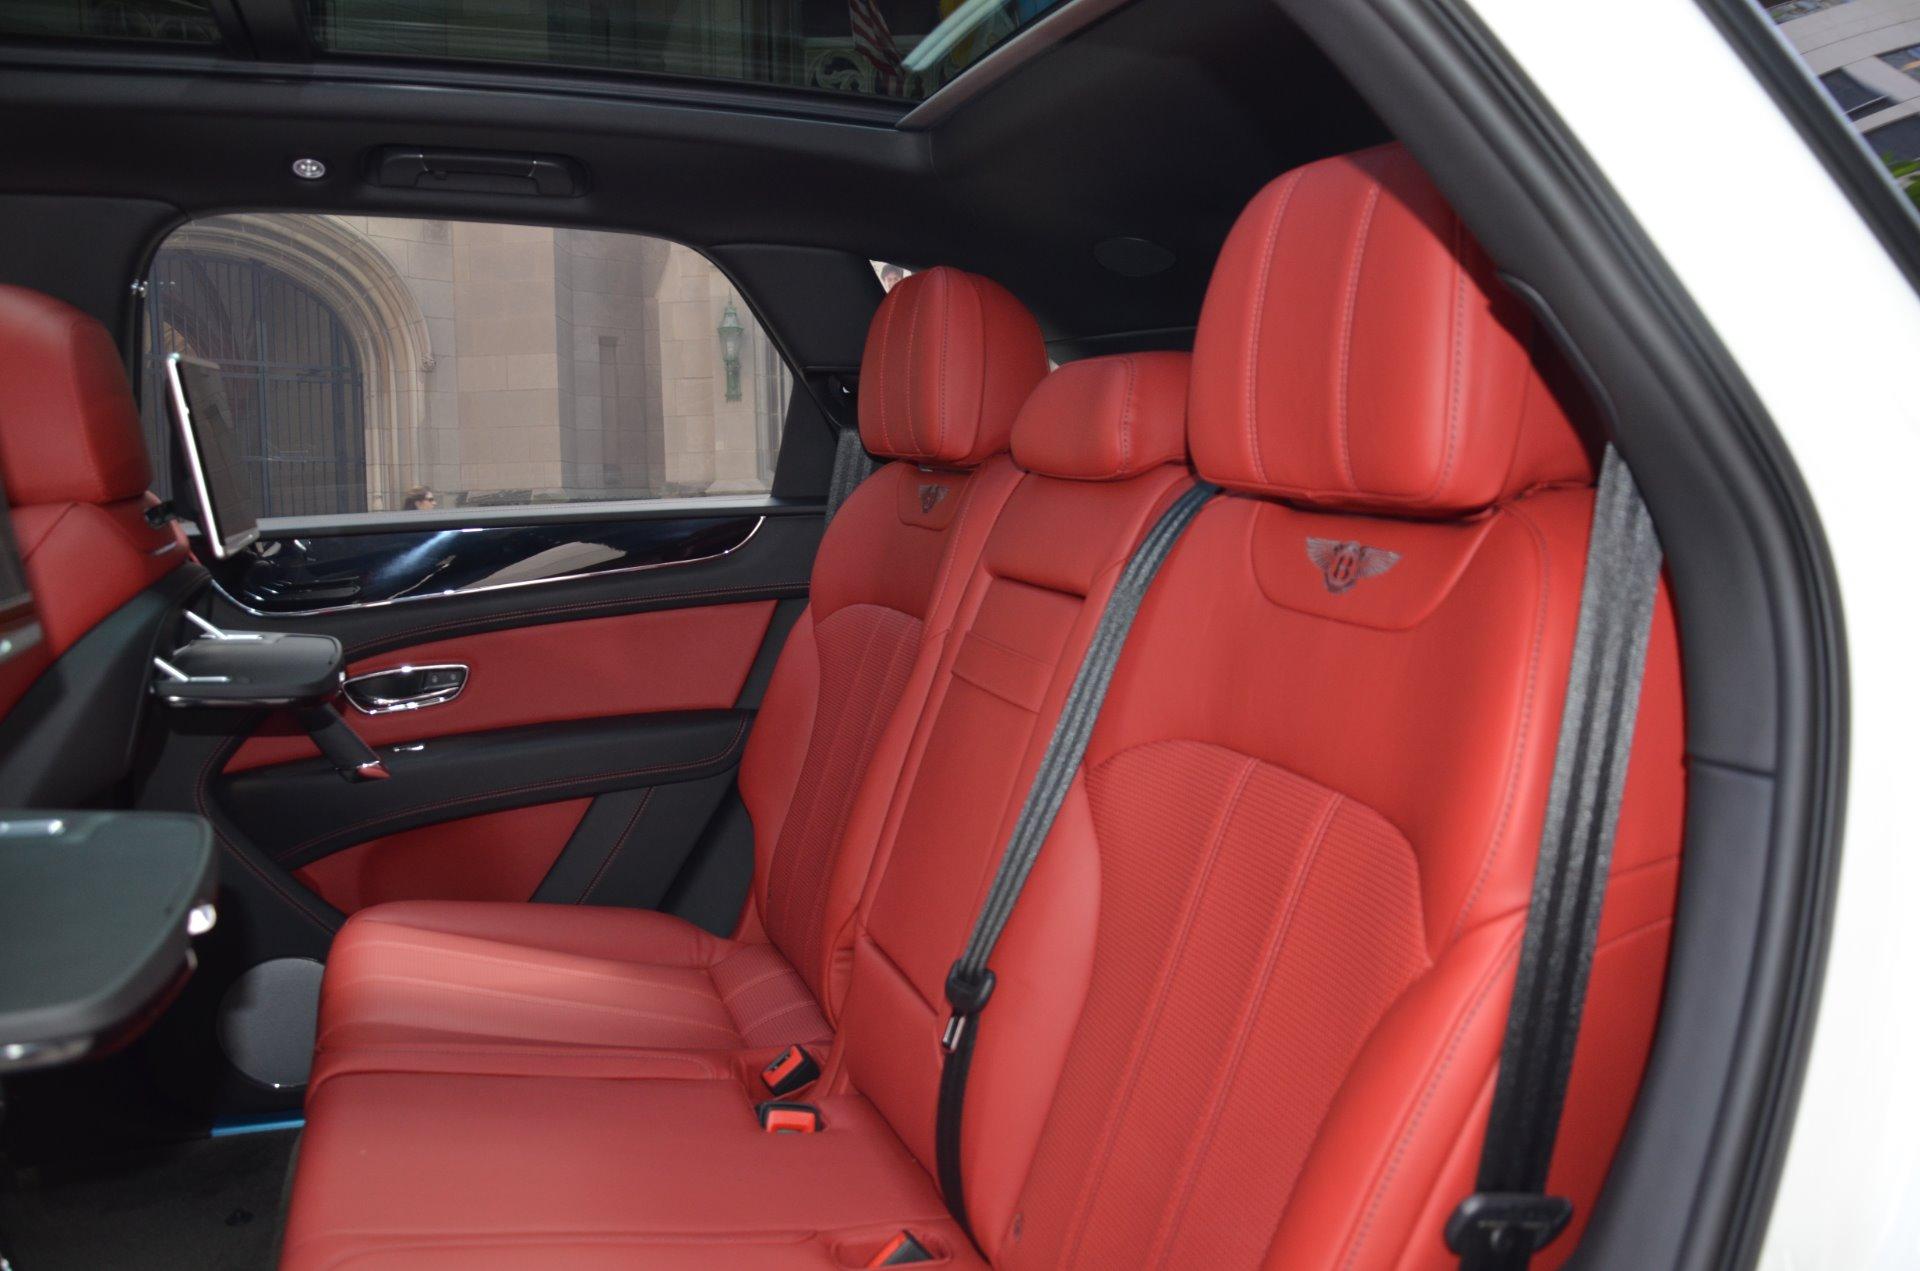 2018 Bentley Bentayga Black Edition Stock B959 S For Sale Near Chicago Il Il Bentley Dealer